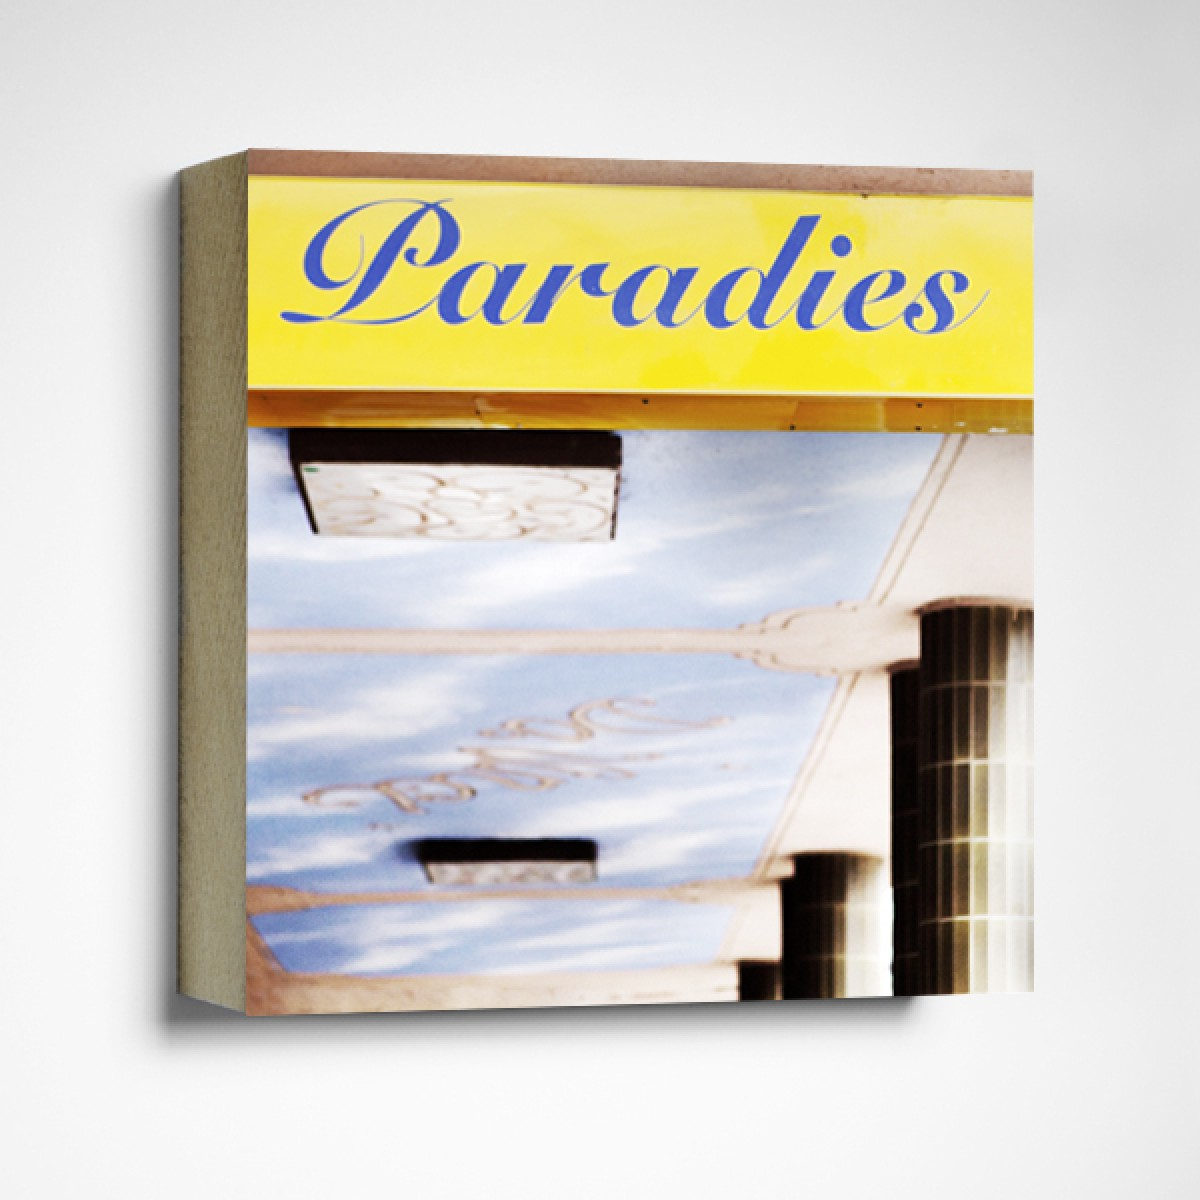 FrankfurterBubb ParadiesFoto-Kachel